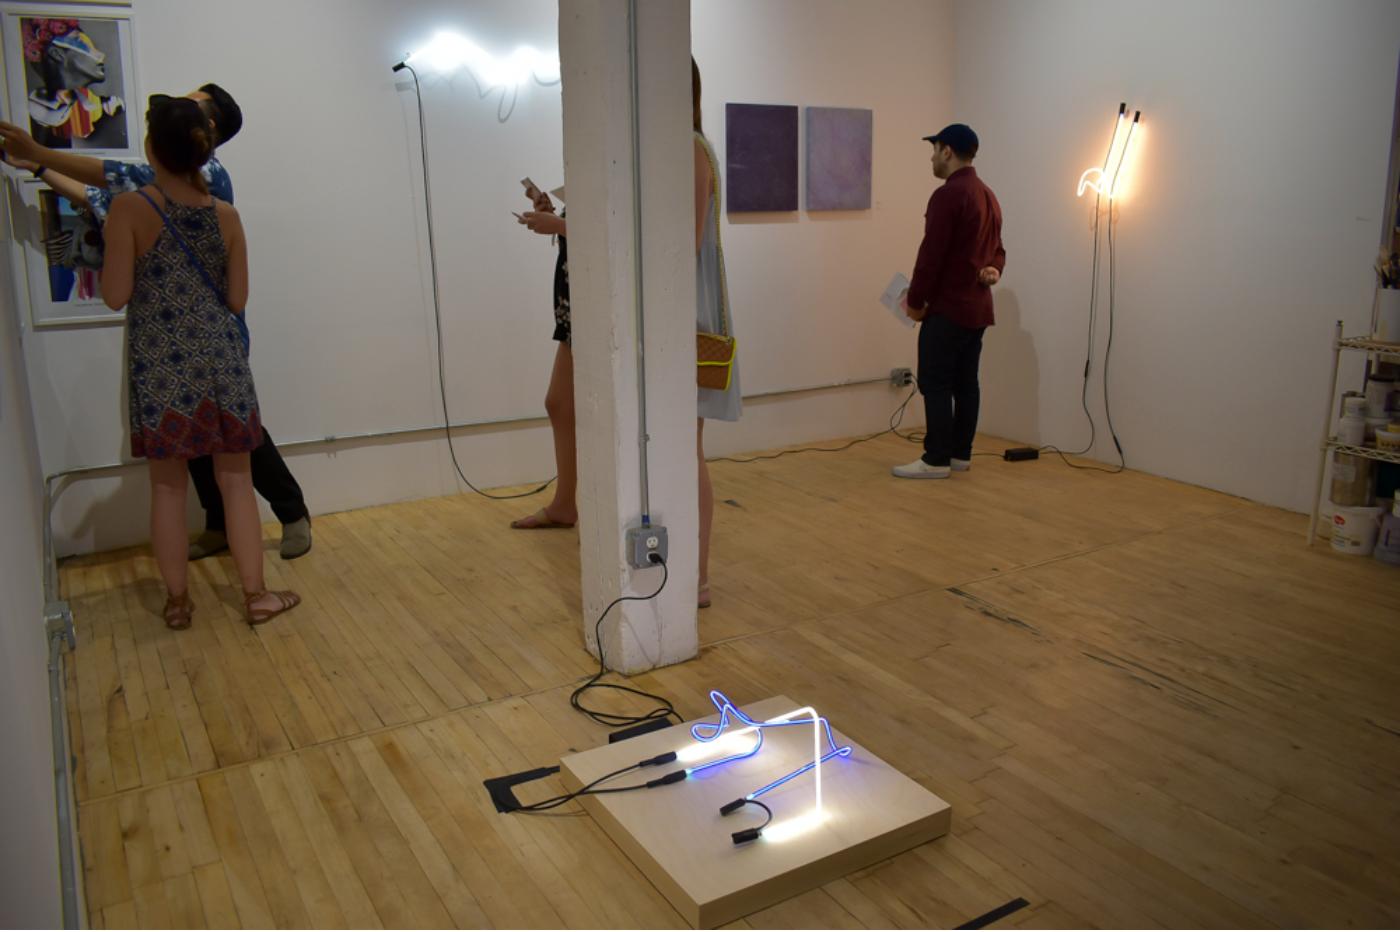 Highlights_from_Bushwick_Open_Studios_2017_-_Arte_Fuse_contemporary_art.png